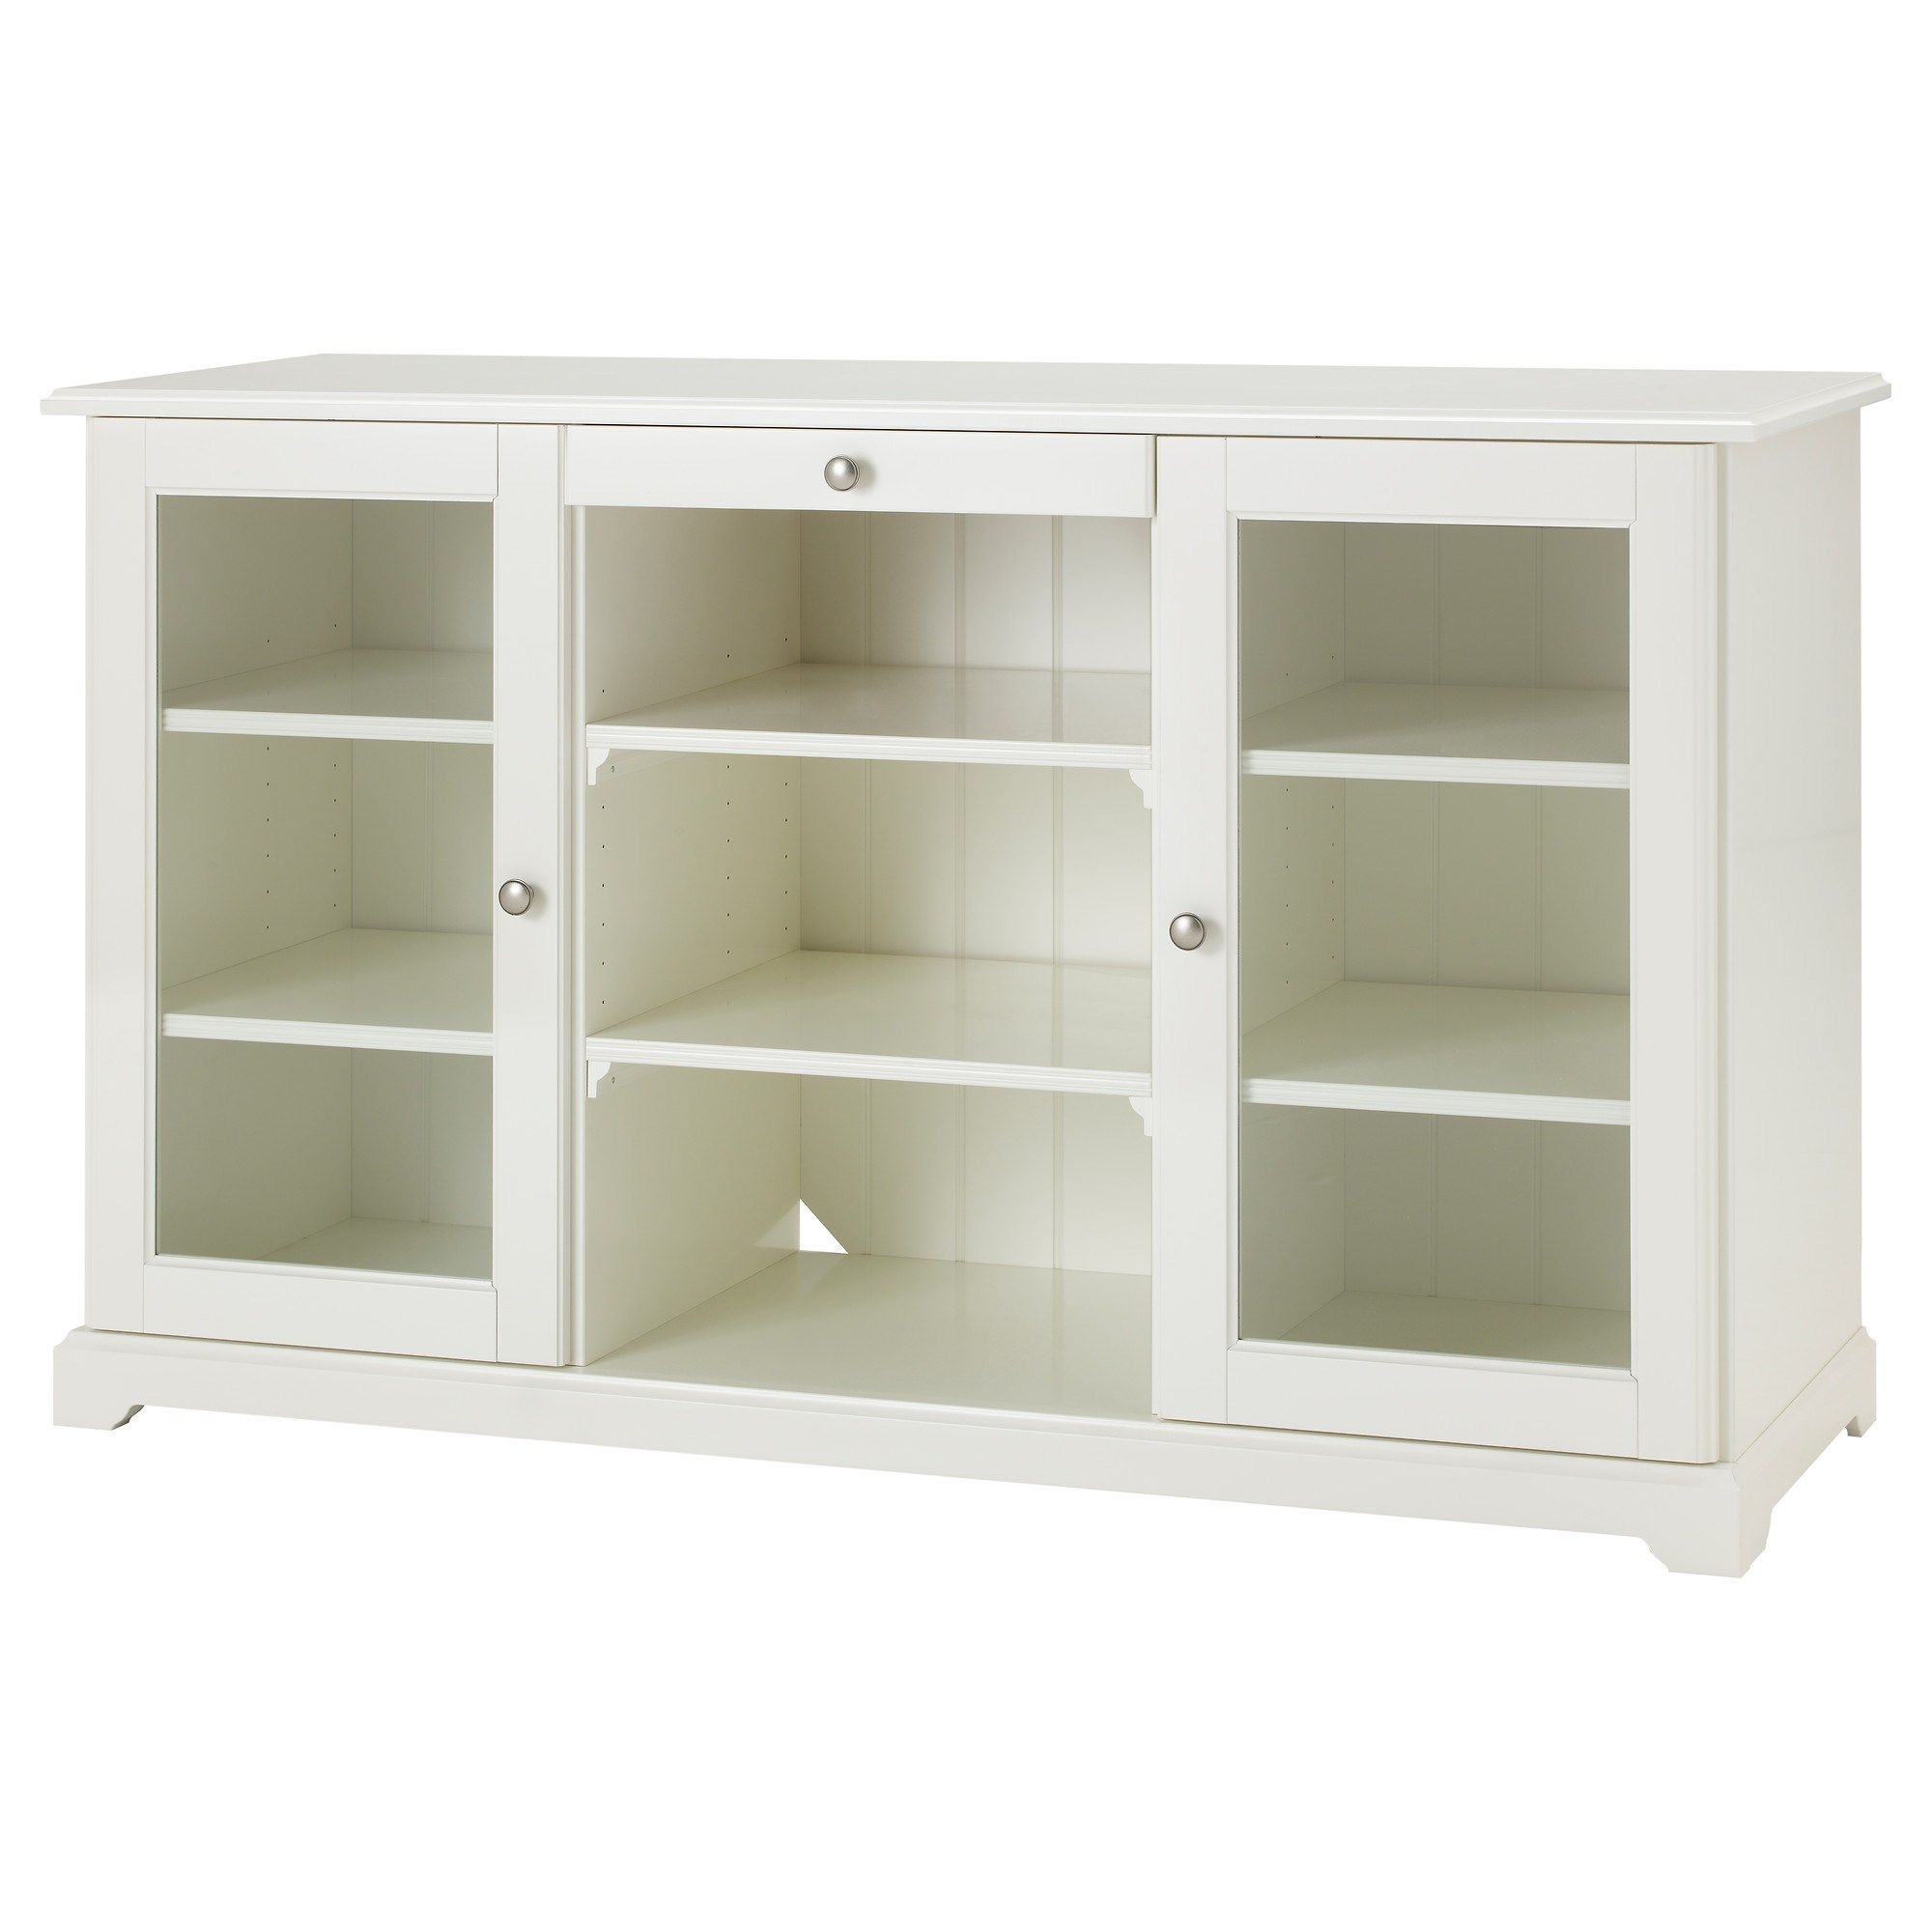 LIATORP büfe, beyaz, 145x87 cm | IKEA Türkiye | Let\'s get Crafty ...